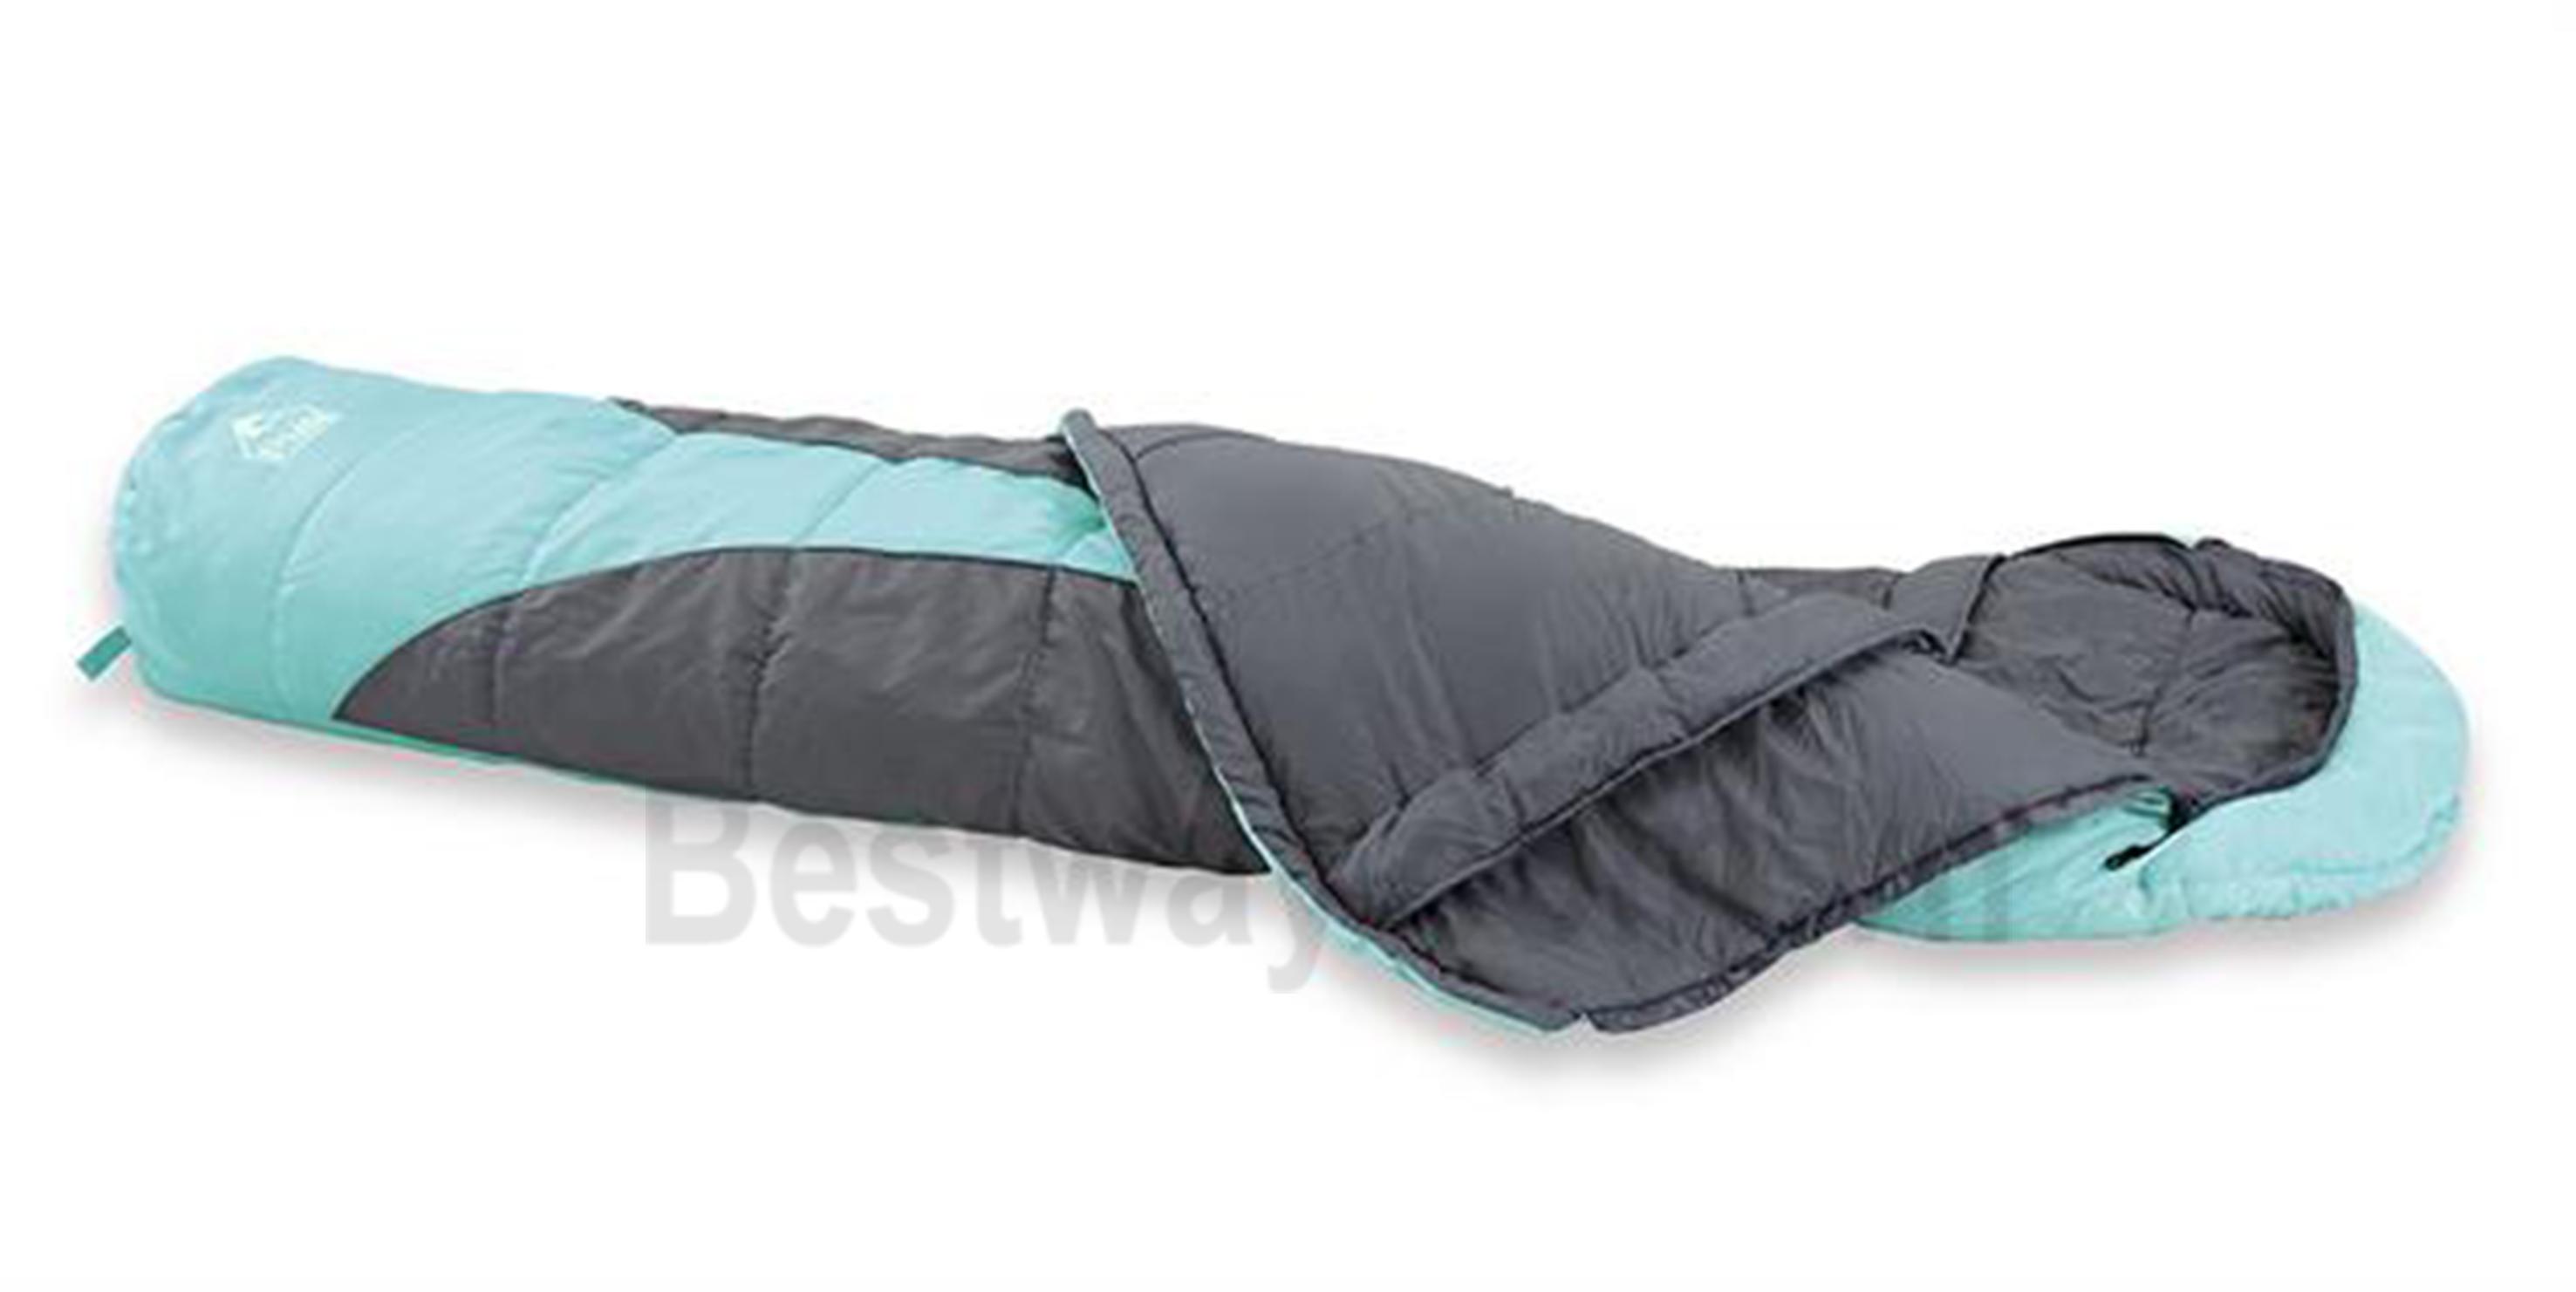 Túi ngủ Bestway - 68049